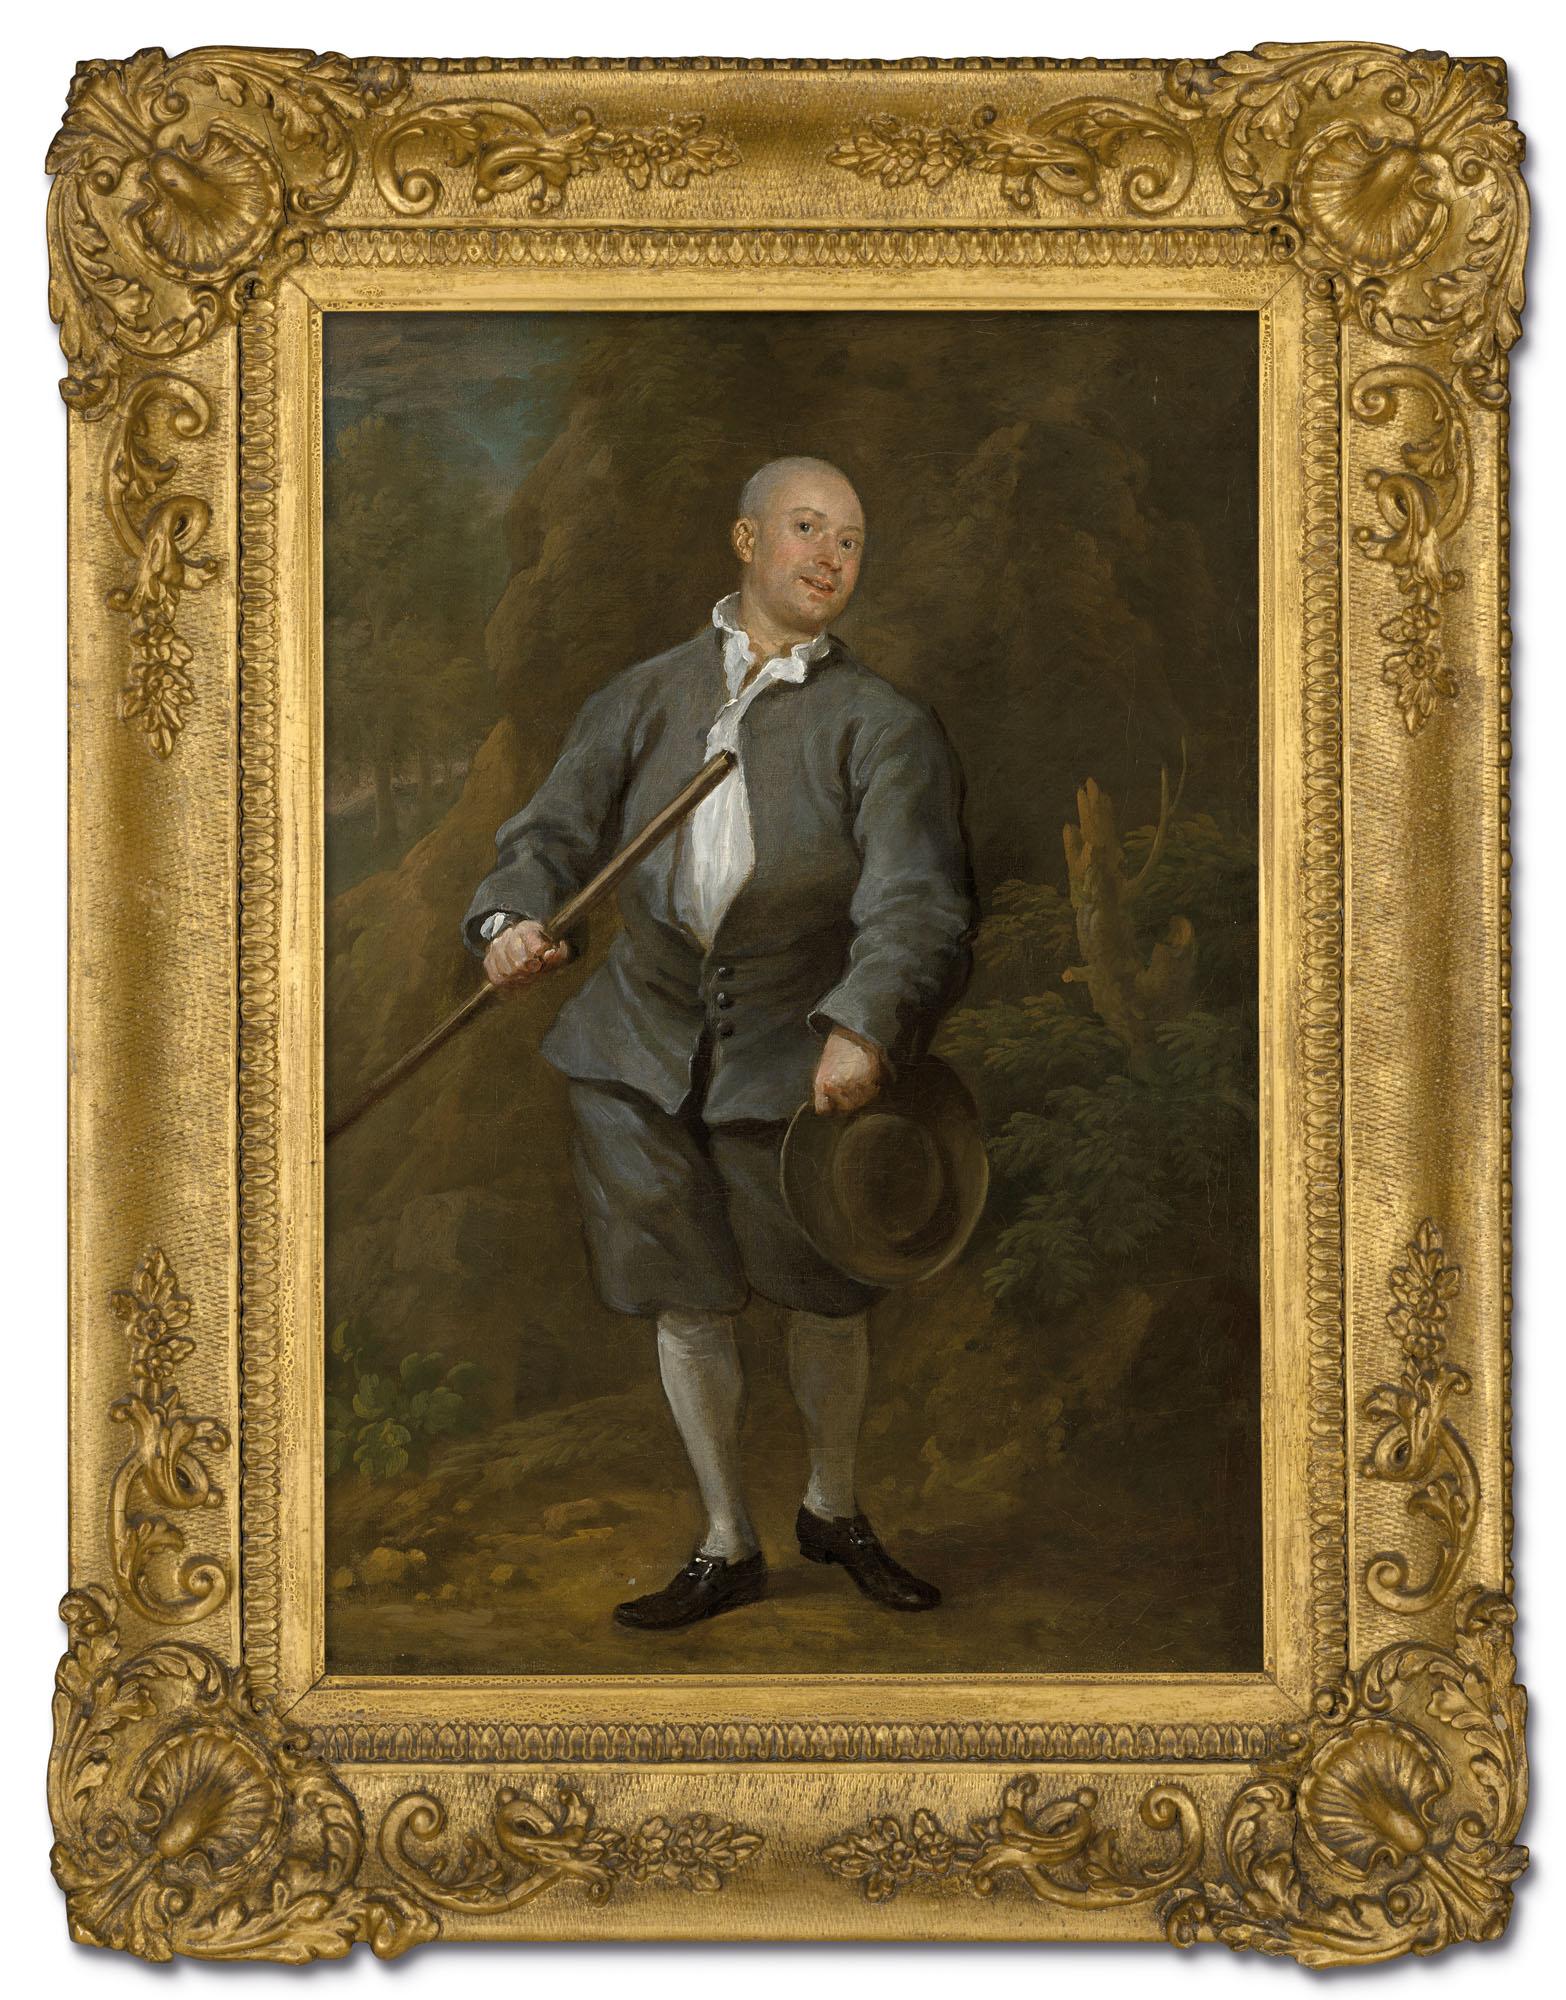 William Hogarth (London 1697-1764)